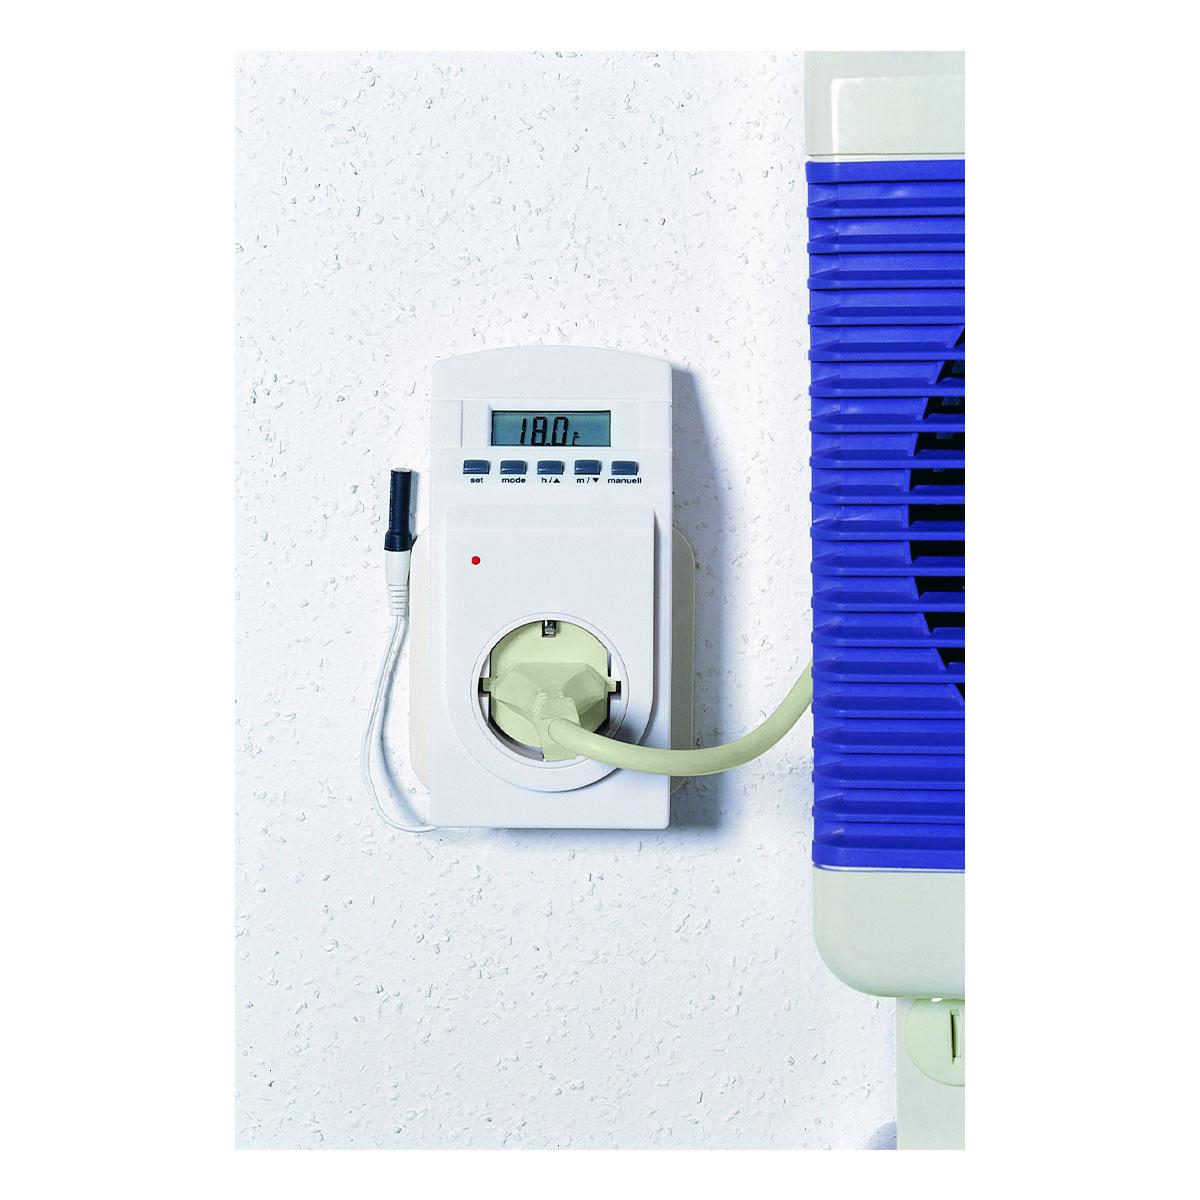 37-3000-thermo-timer-anwendung-1200x1200px.jpg